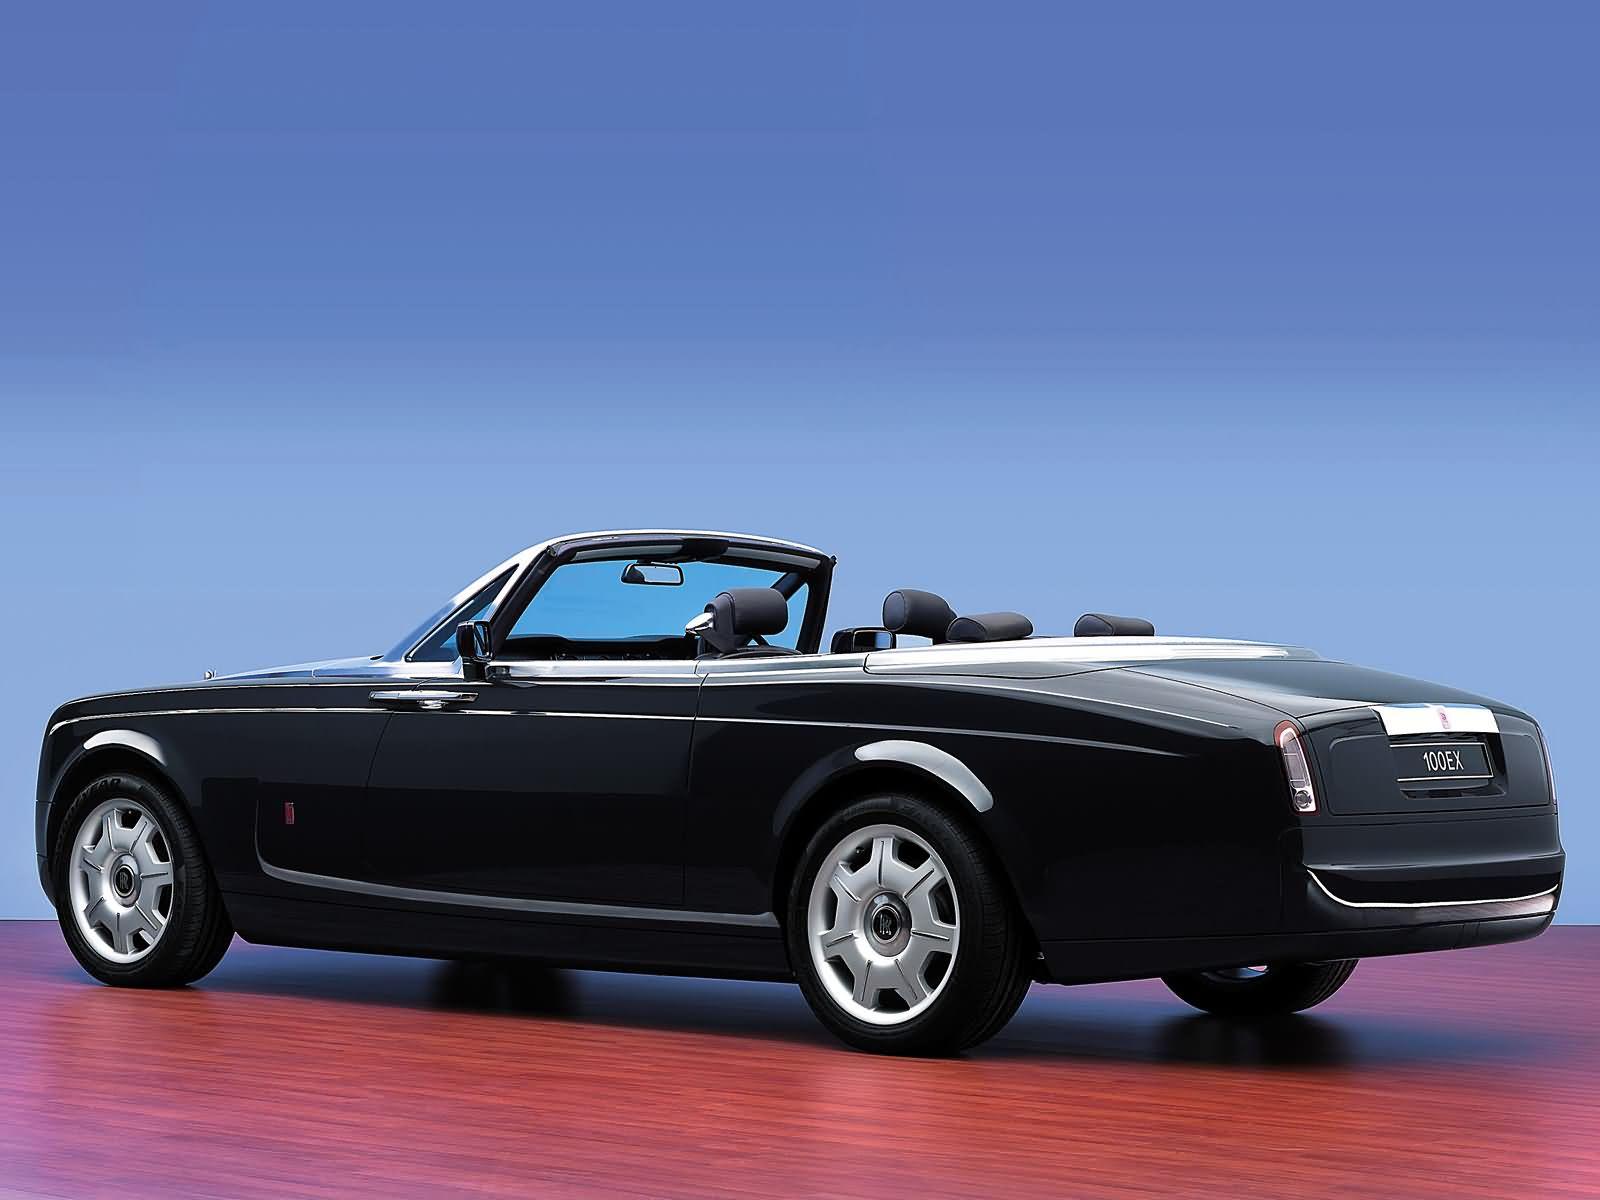 Rolls-Royce 100EX picture # 5560 | Rolls-Royce photo gallery